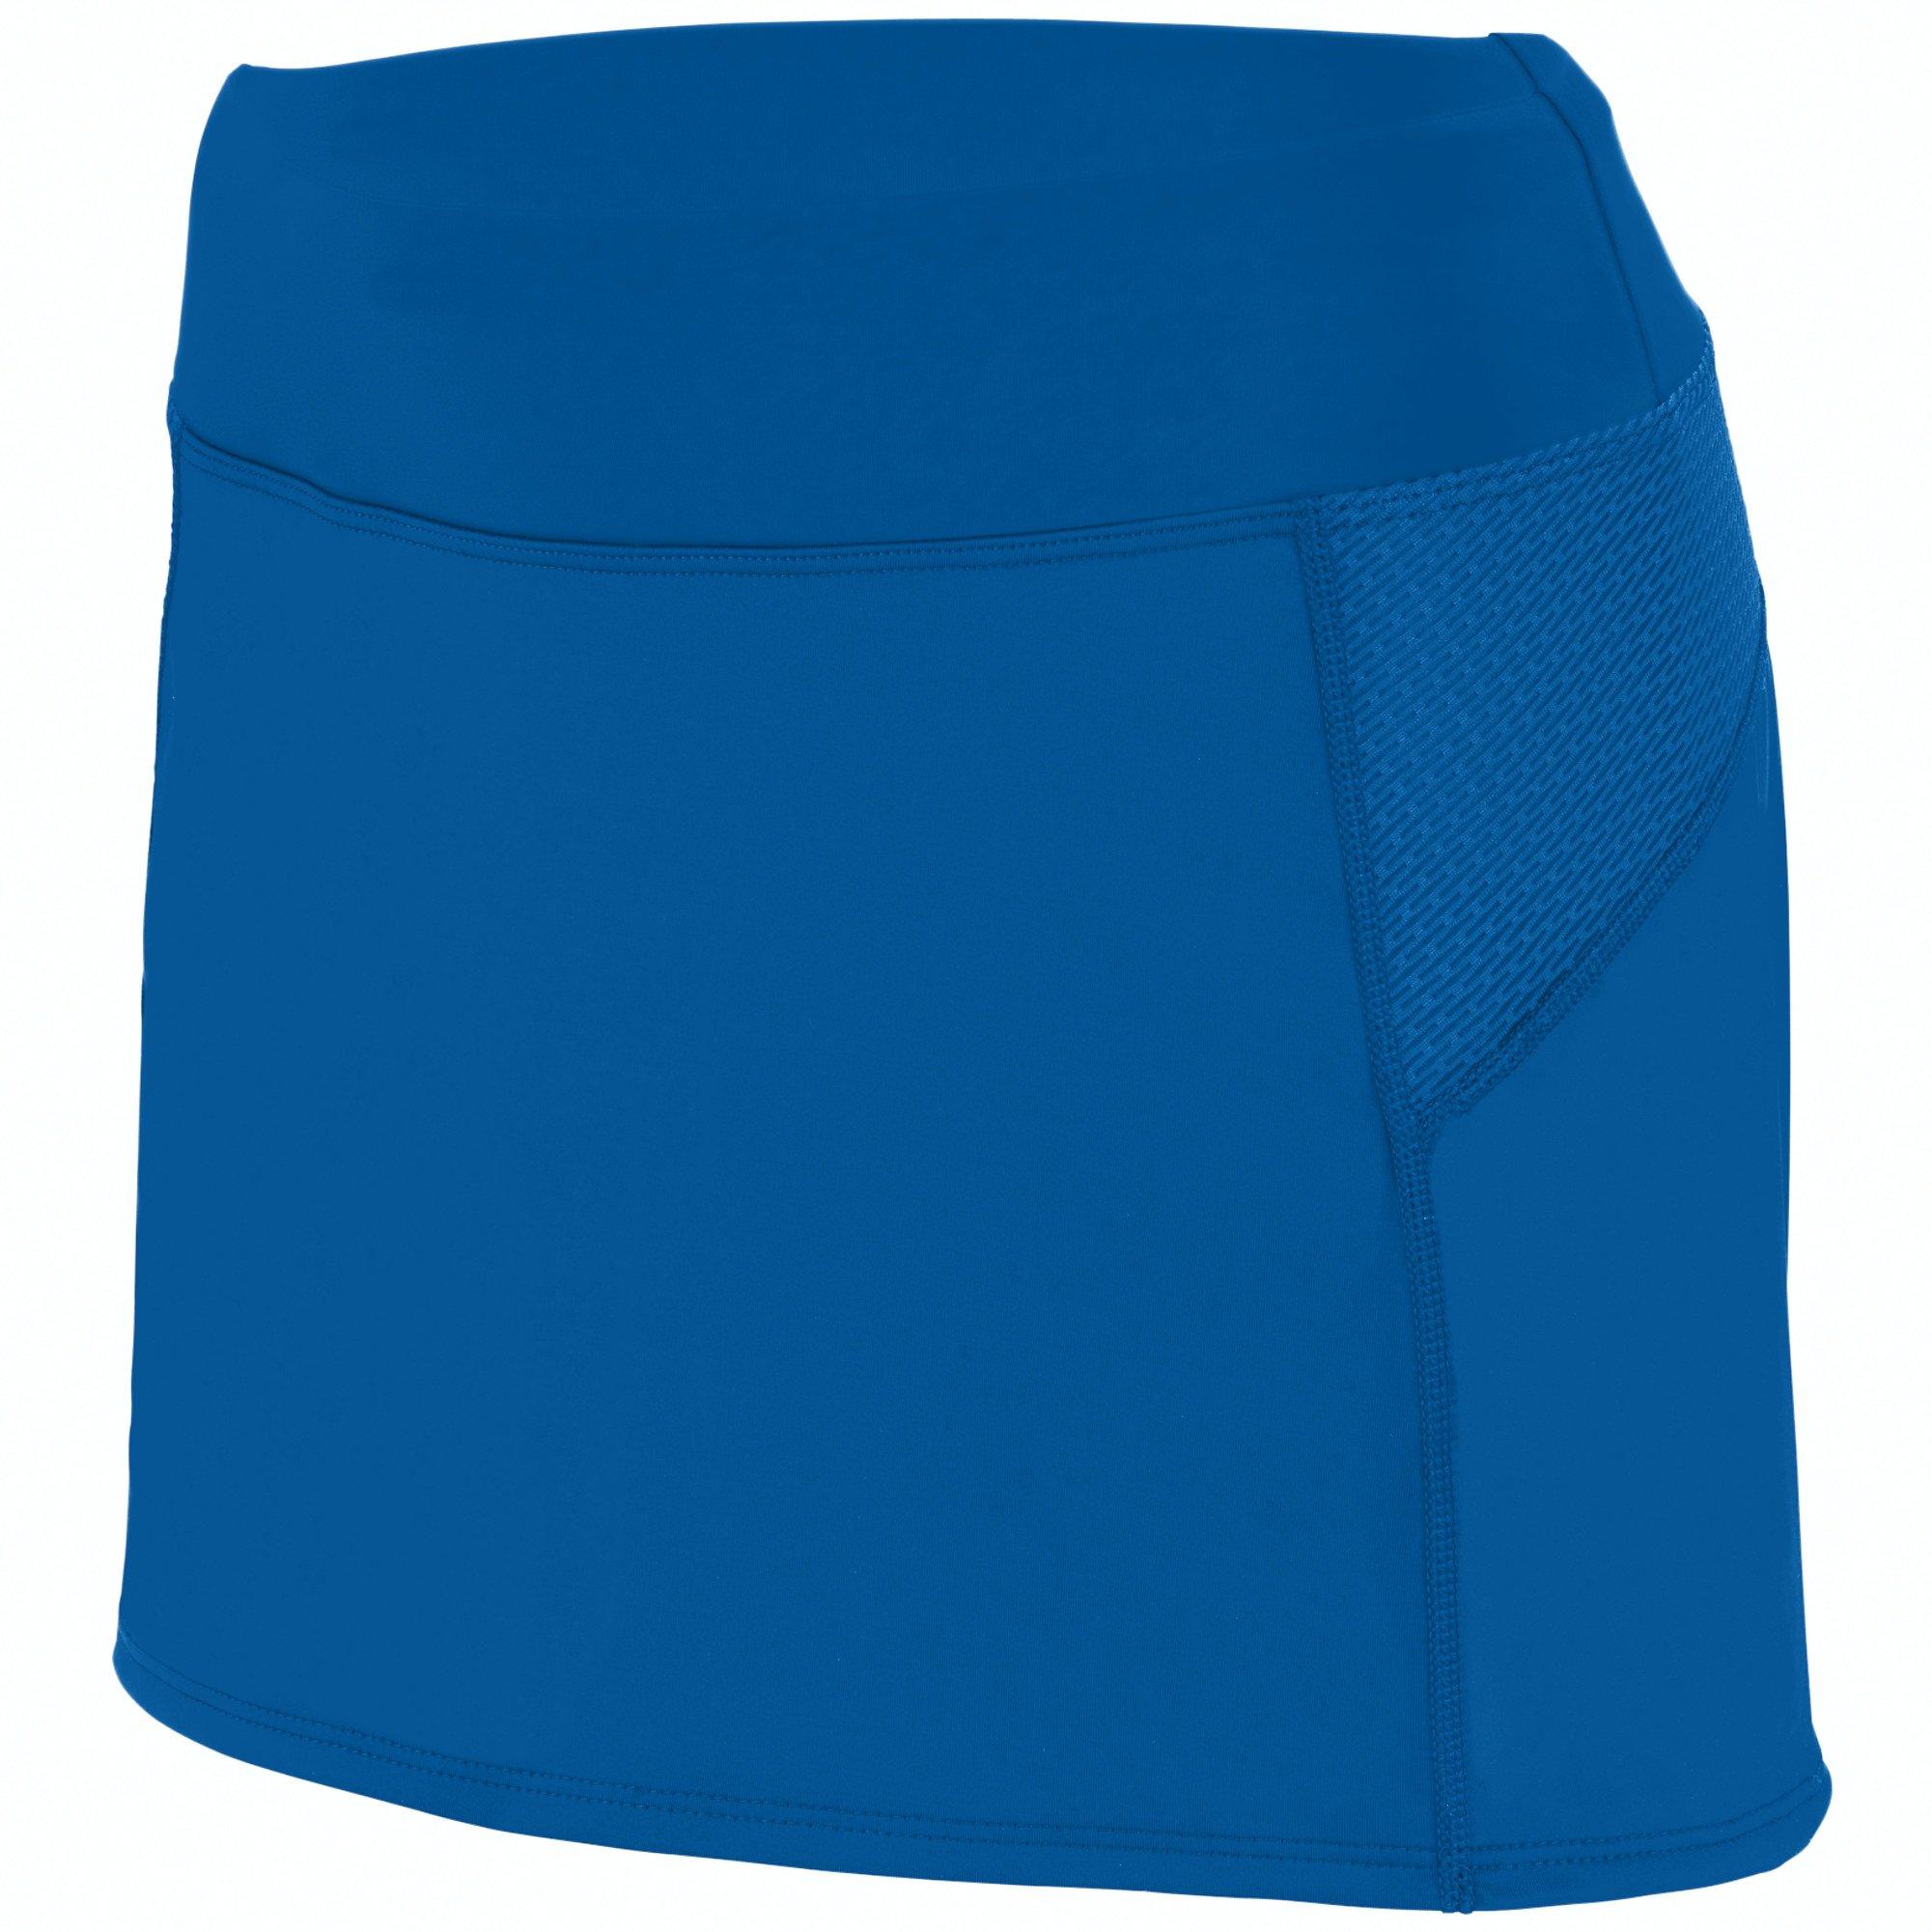 Augusta Sportswear Girls Femfit Skort L Royal/Graphite by Augusta Sportswear